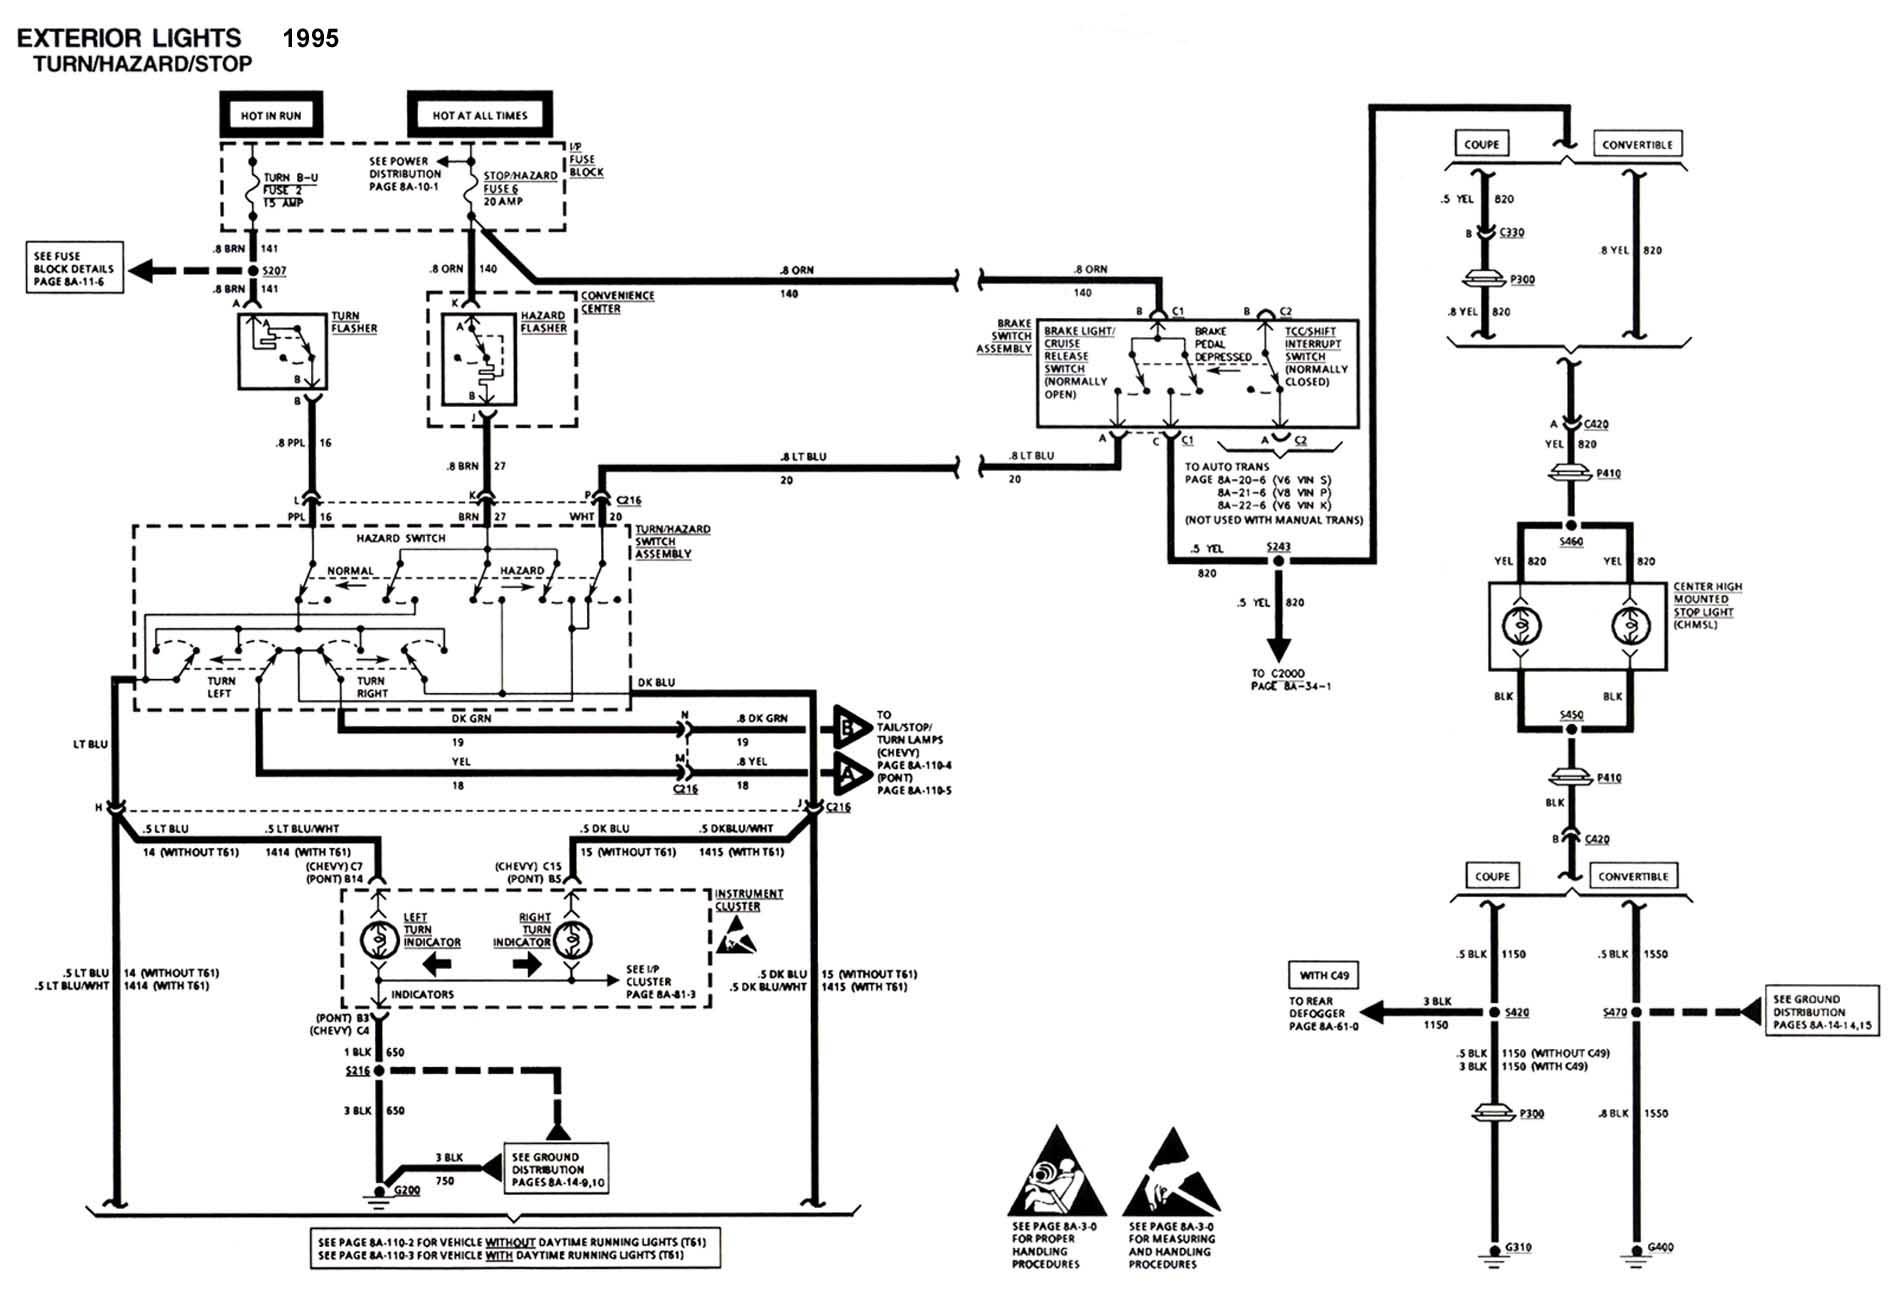 Fine Help On A 4Th Wiring Issue Third Generation F Body Message Boards Wiring Cloud Rineaidewilluminateatxorg